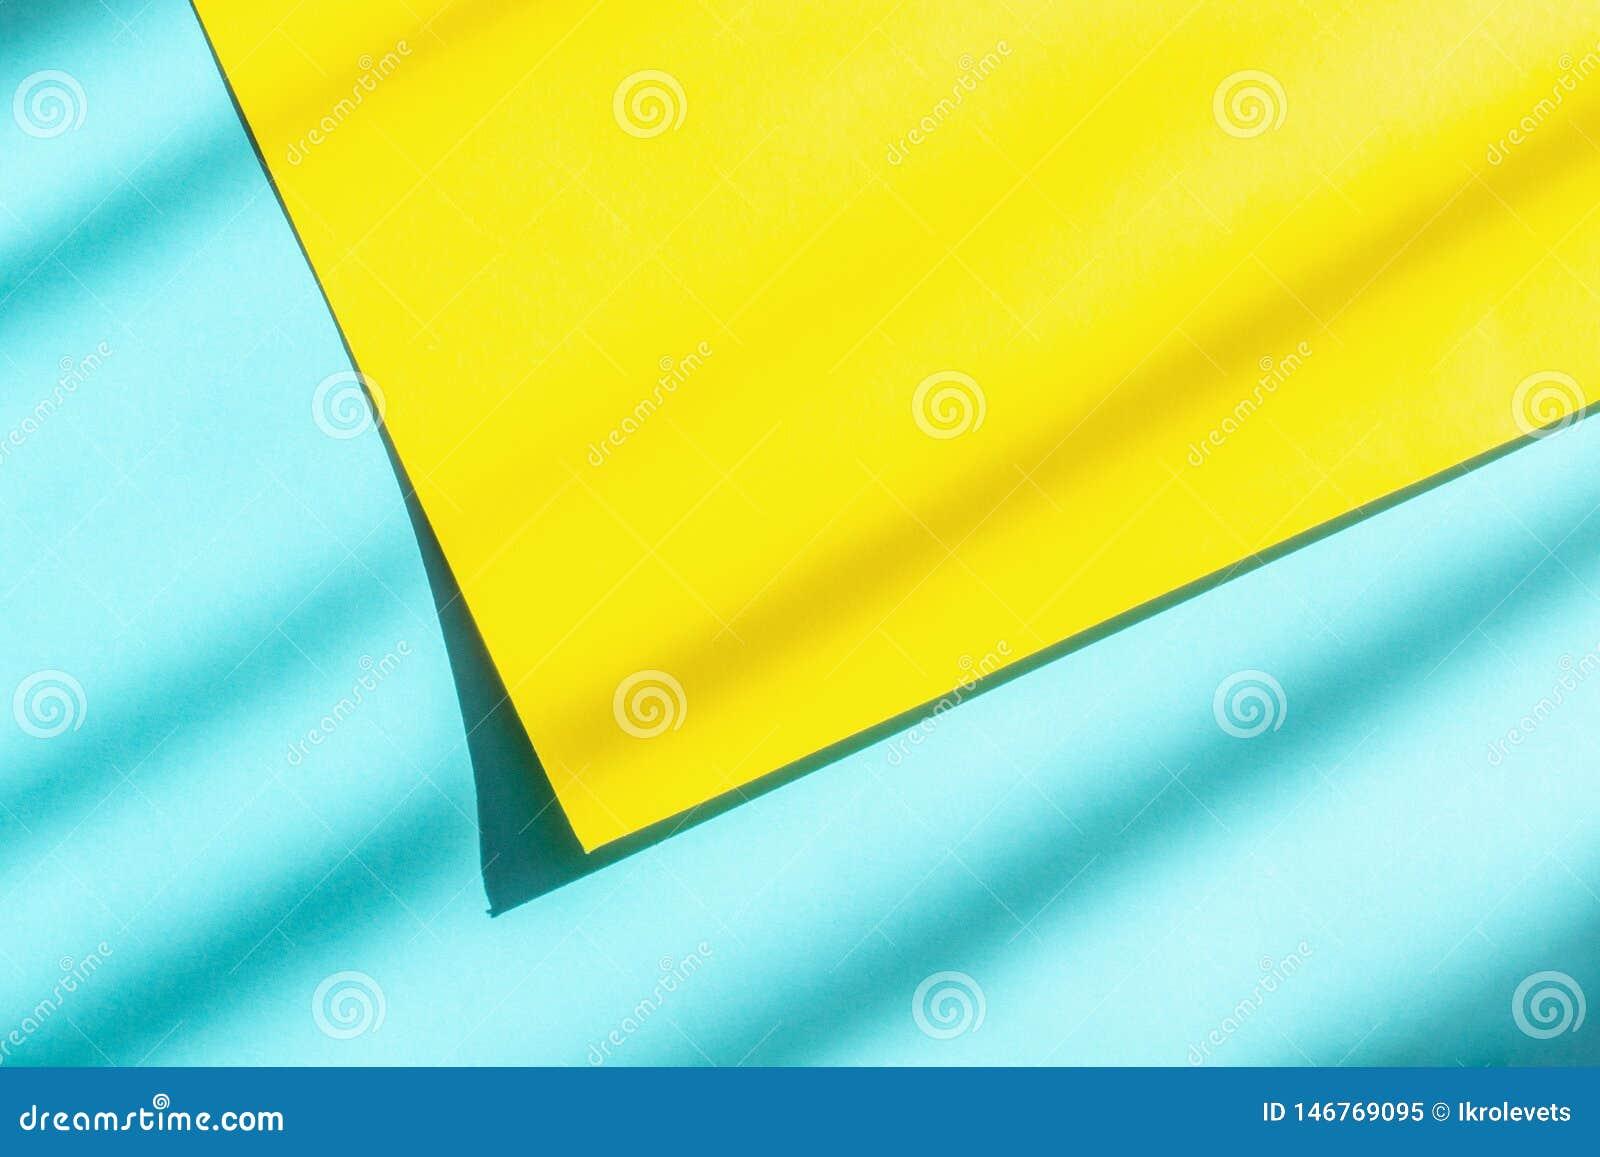 Fundo de papel azul e amarelo abstrato com luz dura e sombra para seu projeto